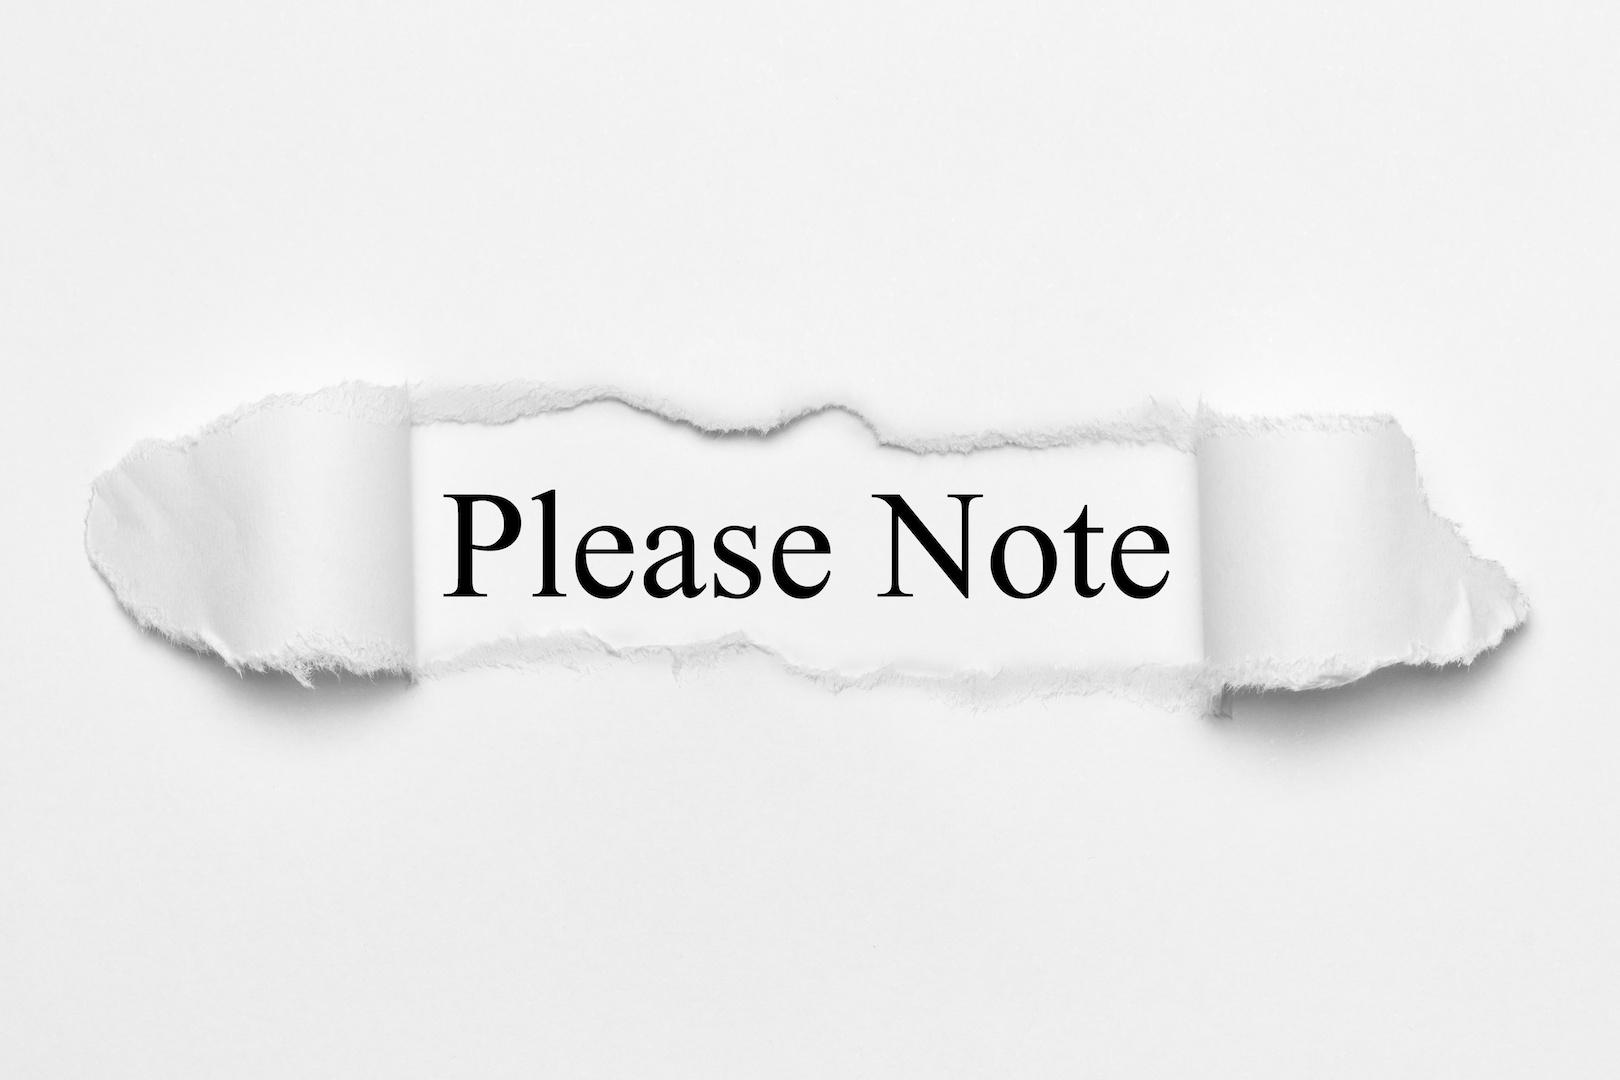 Please Note - AdobeStock_135190548